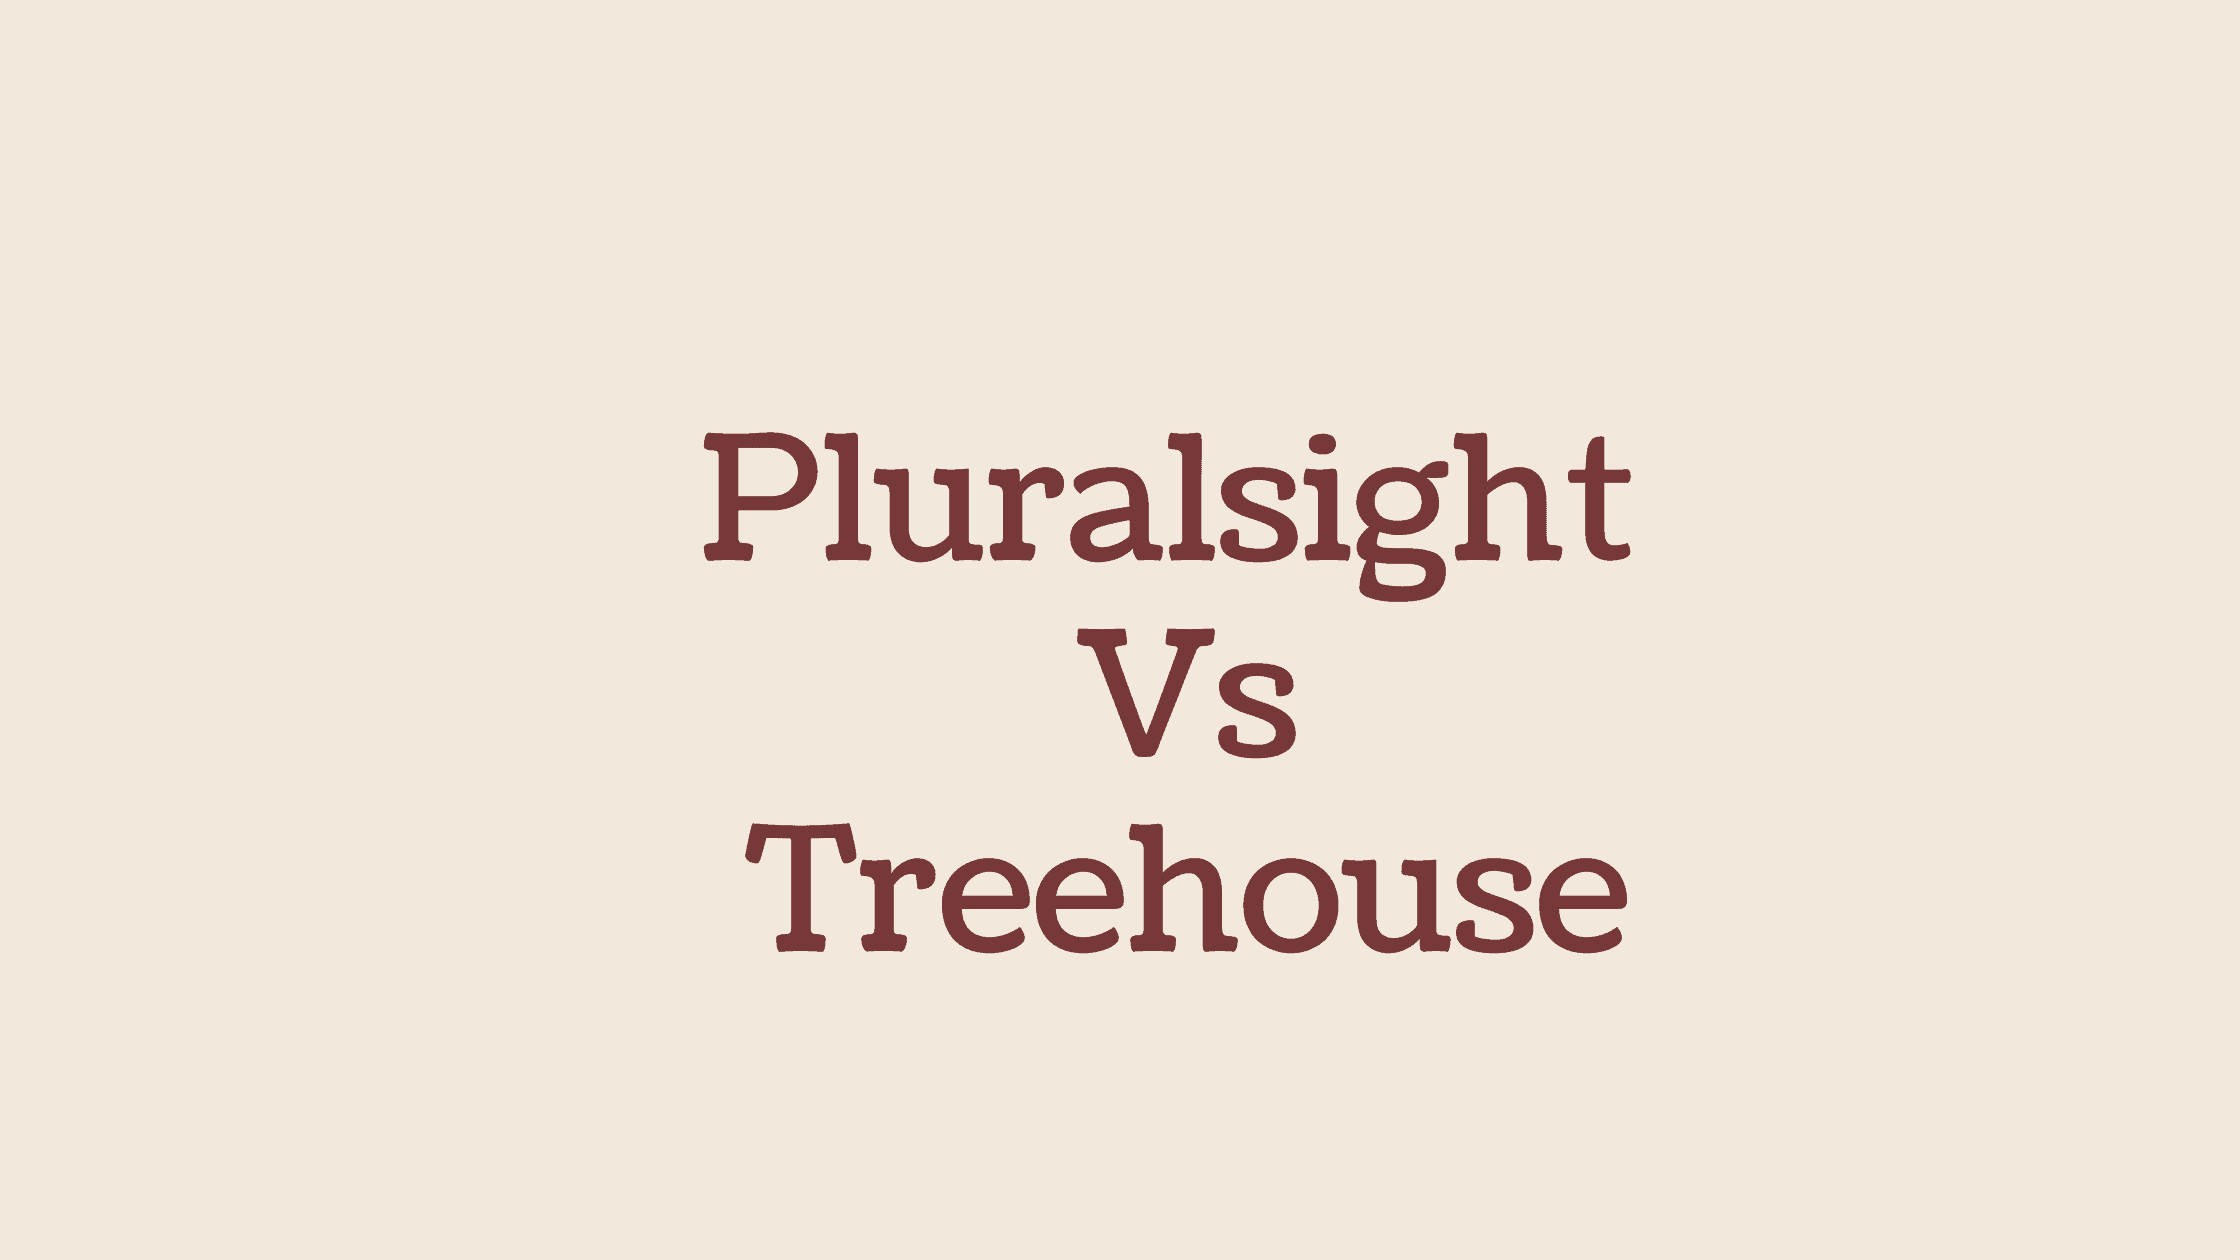 Pluralsight vs Treehouse